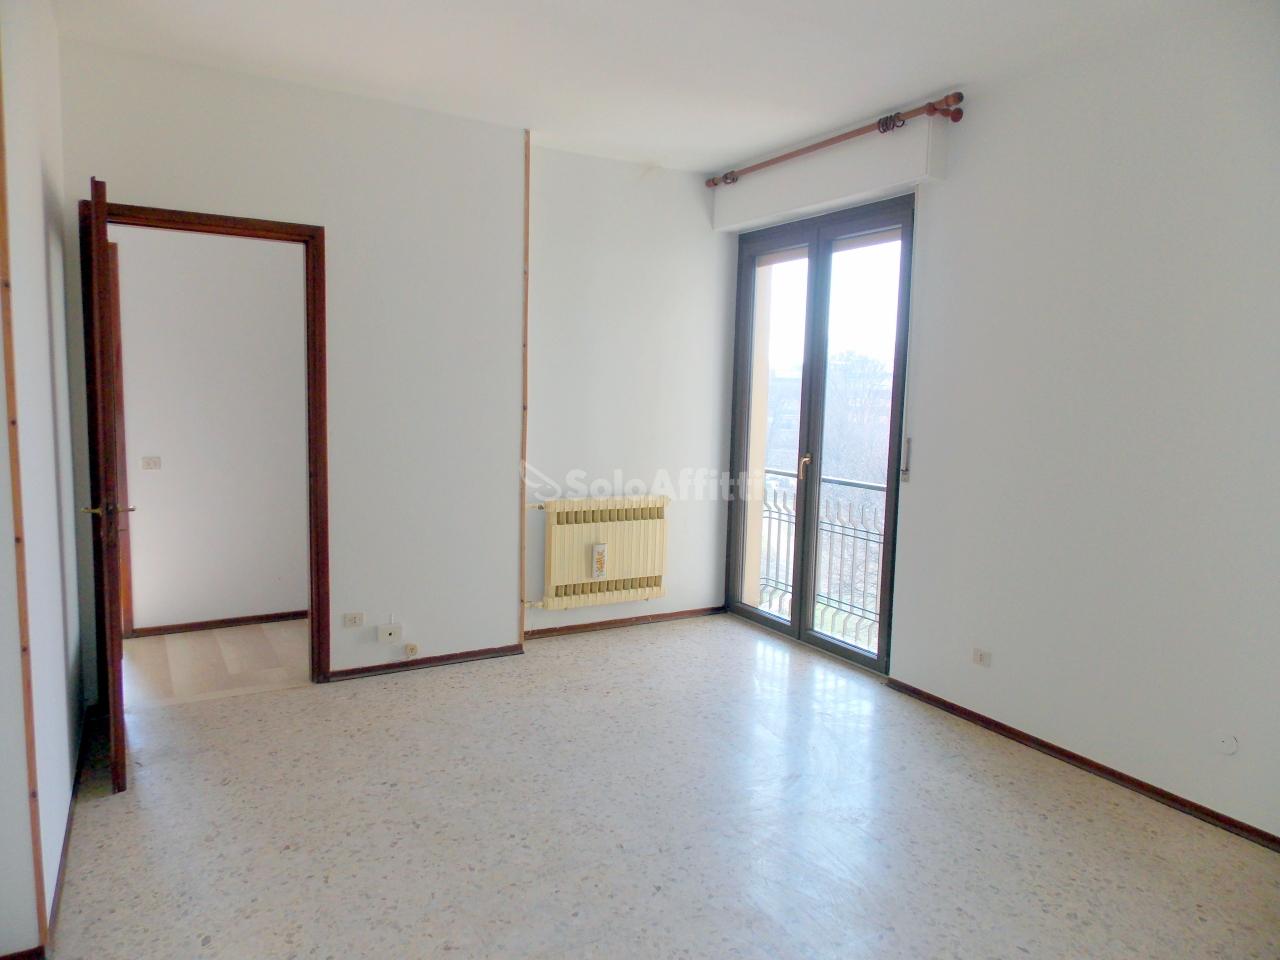 Bilocale Novara Via Nicola Sottile  24 1